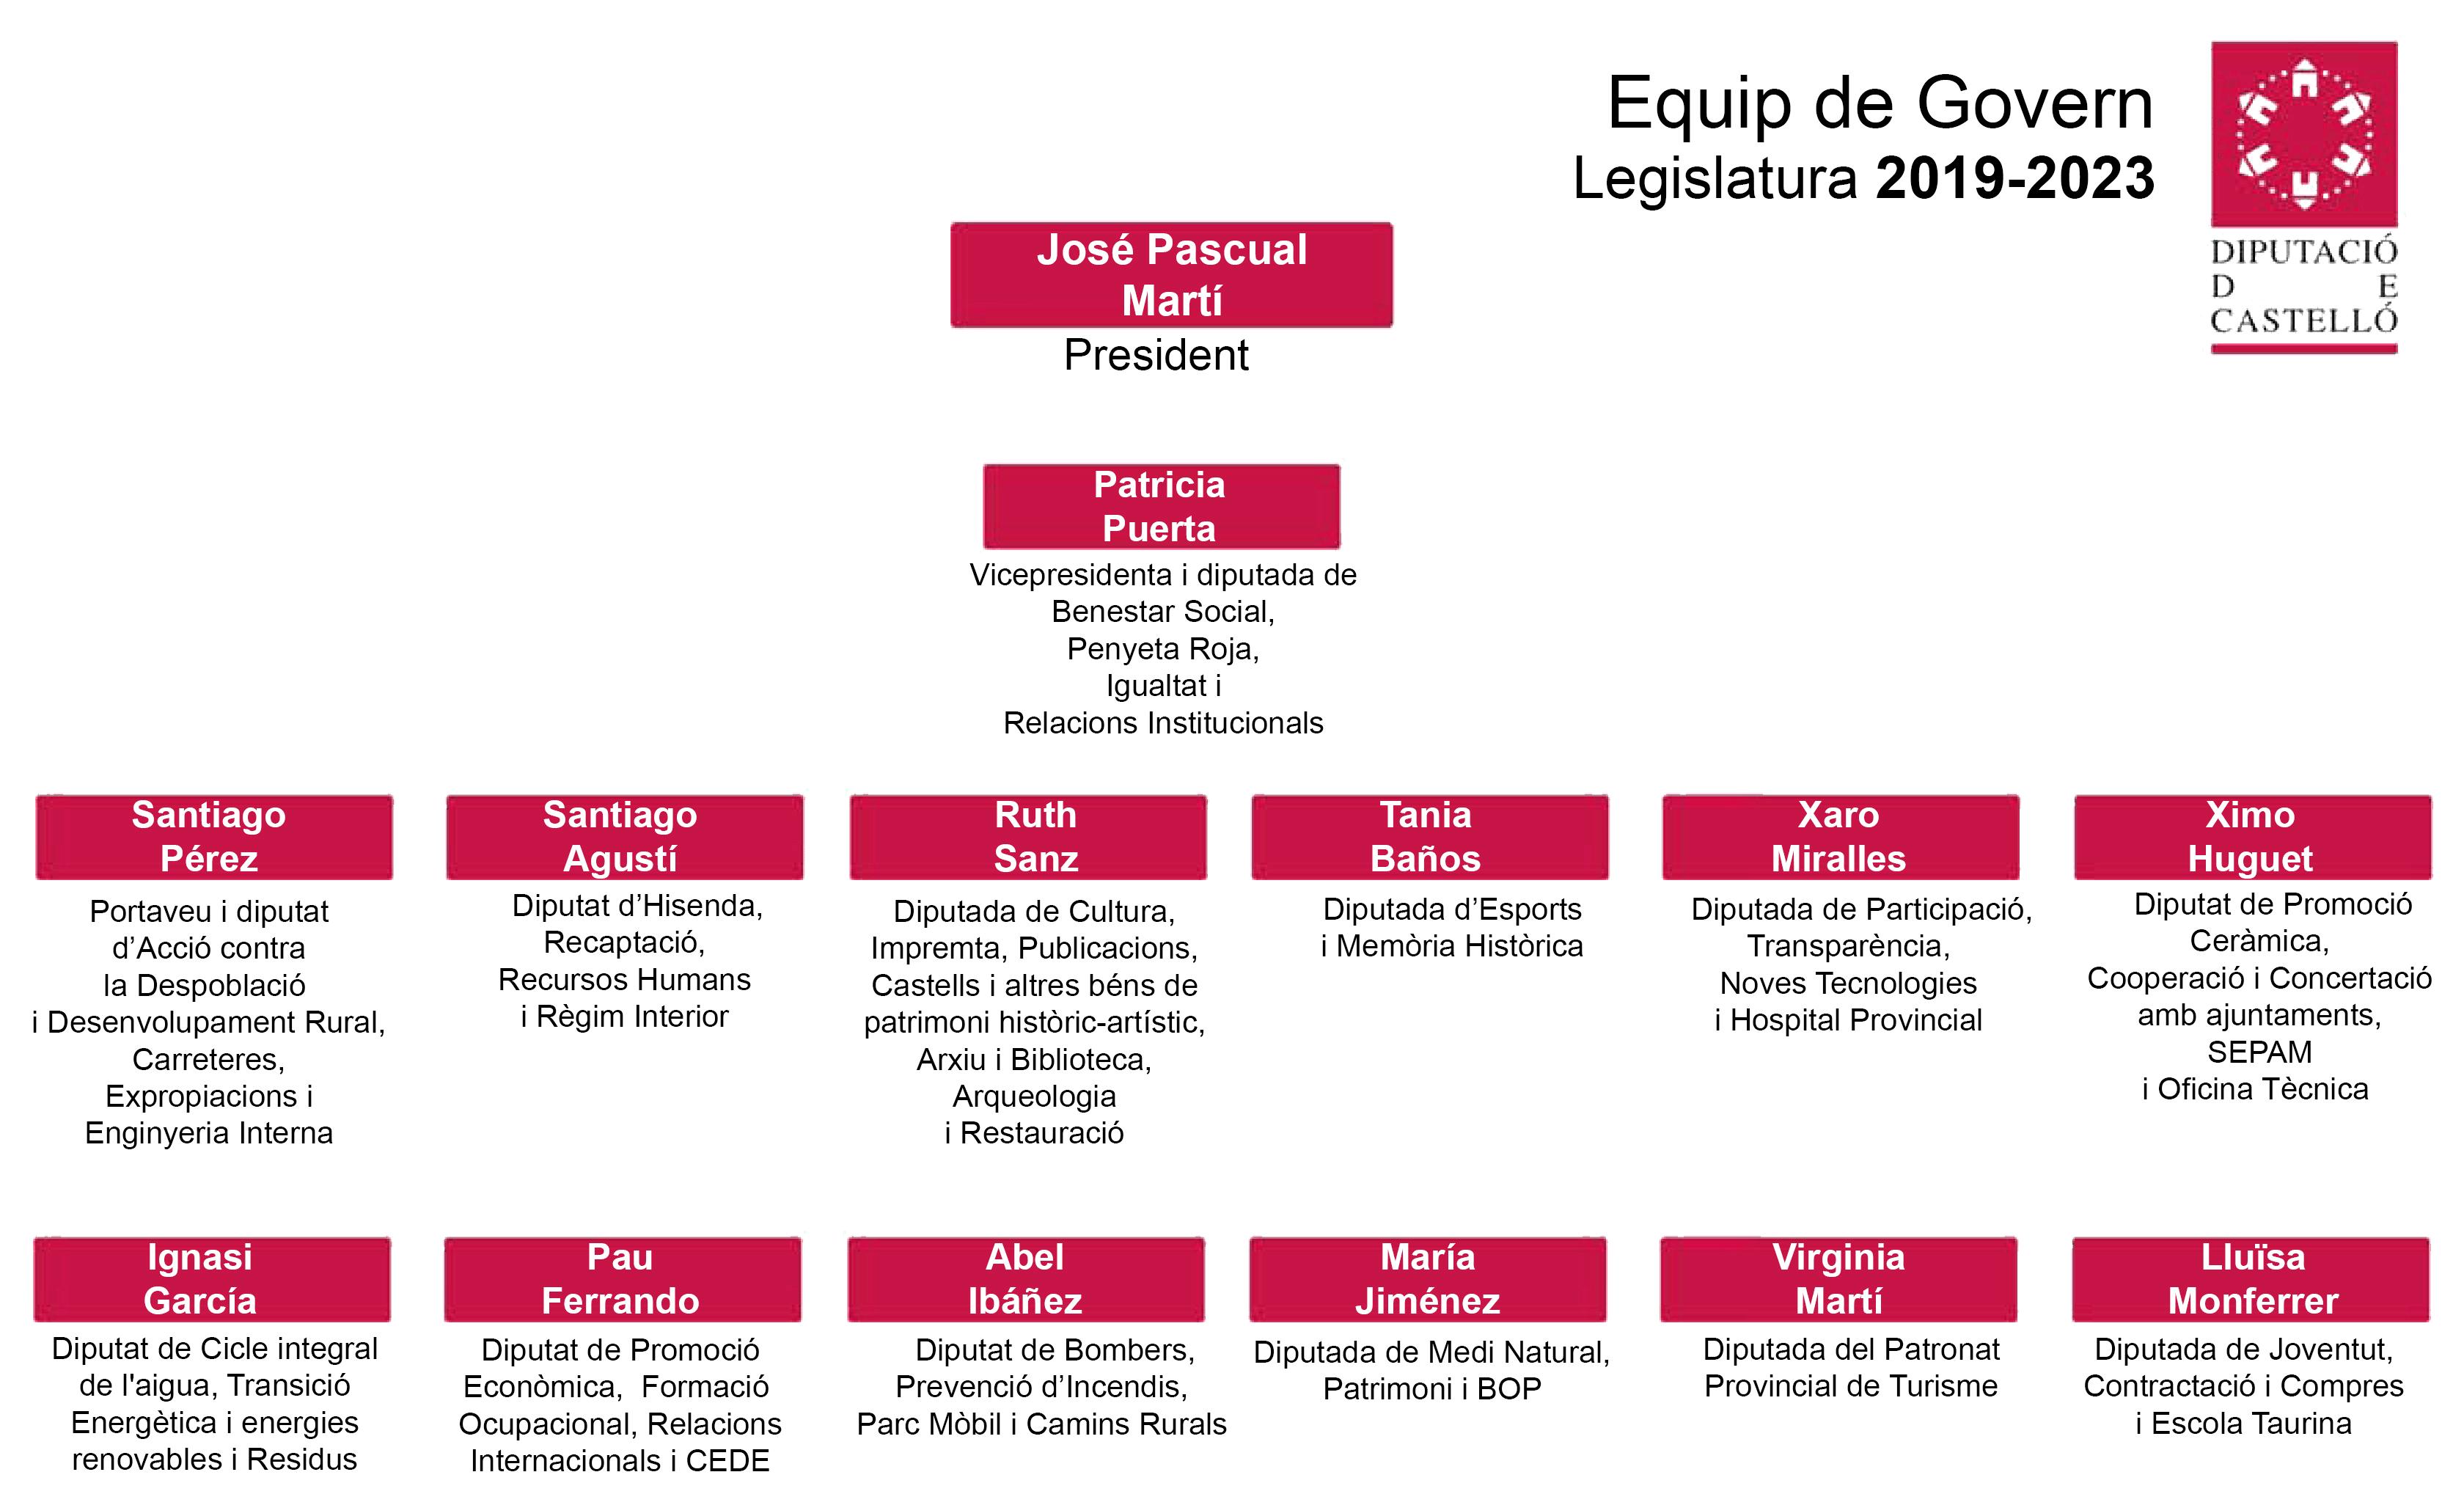 Equip de Govern